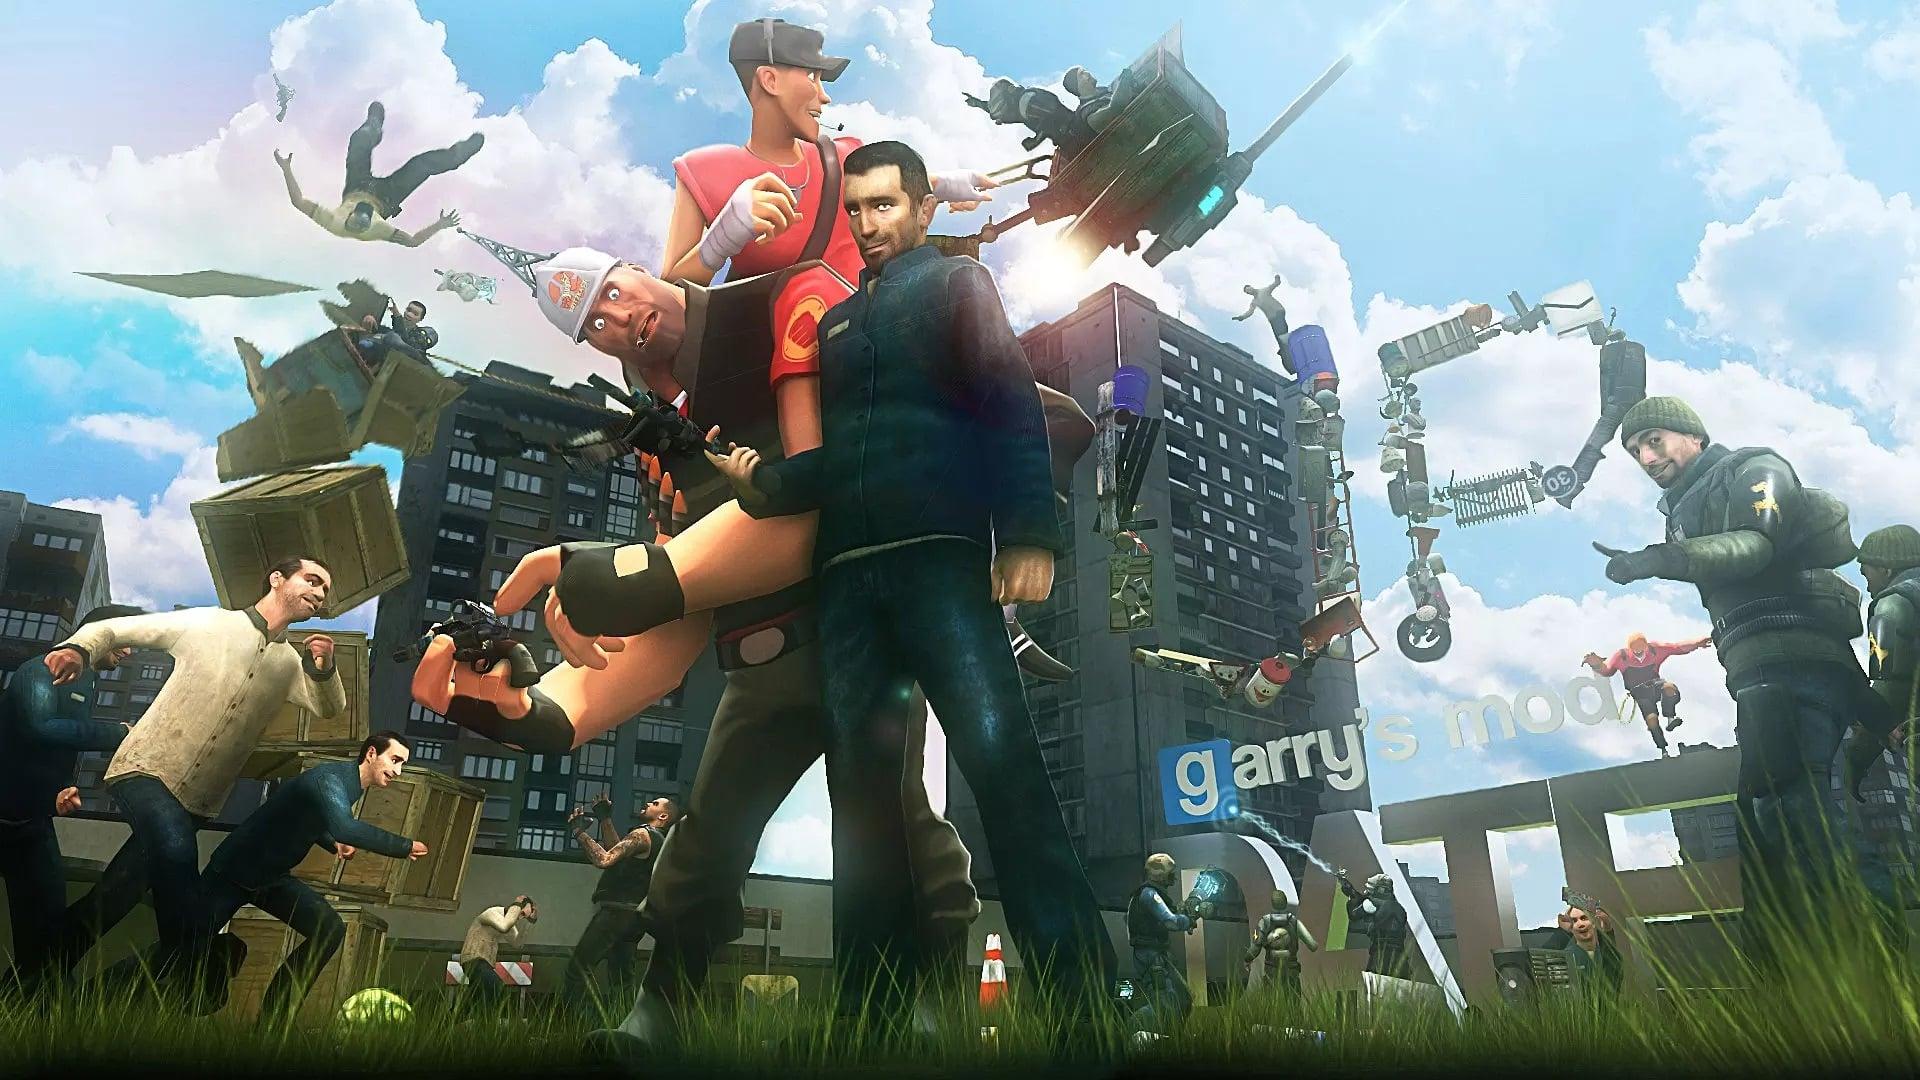 Garrys Mod PC Game Full Version Free Download - The Gamer HQ